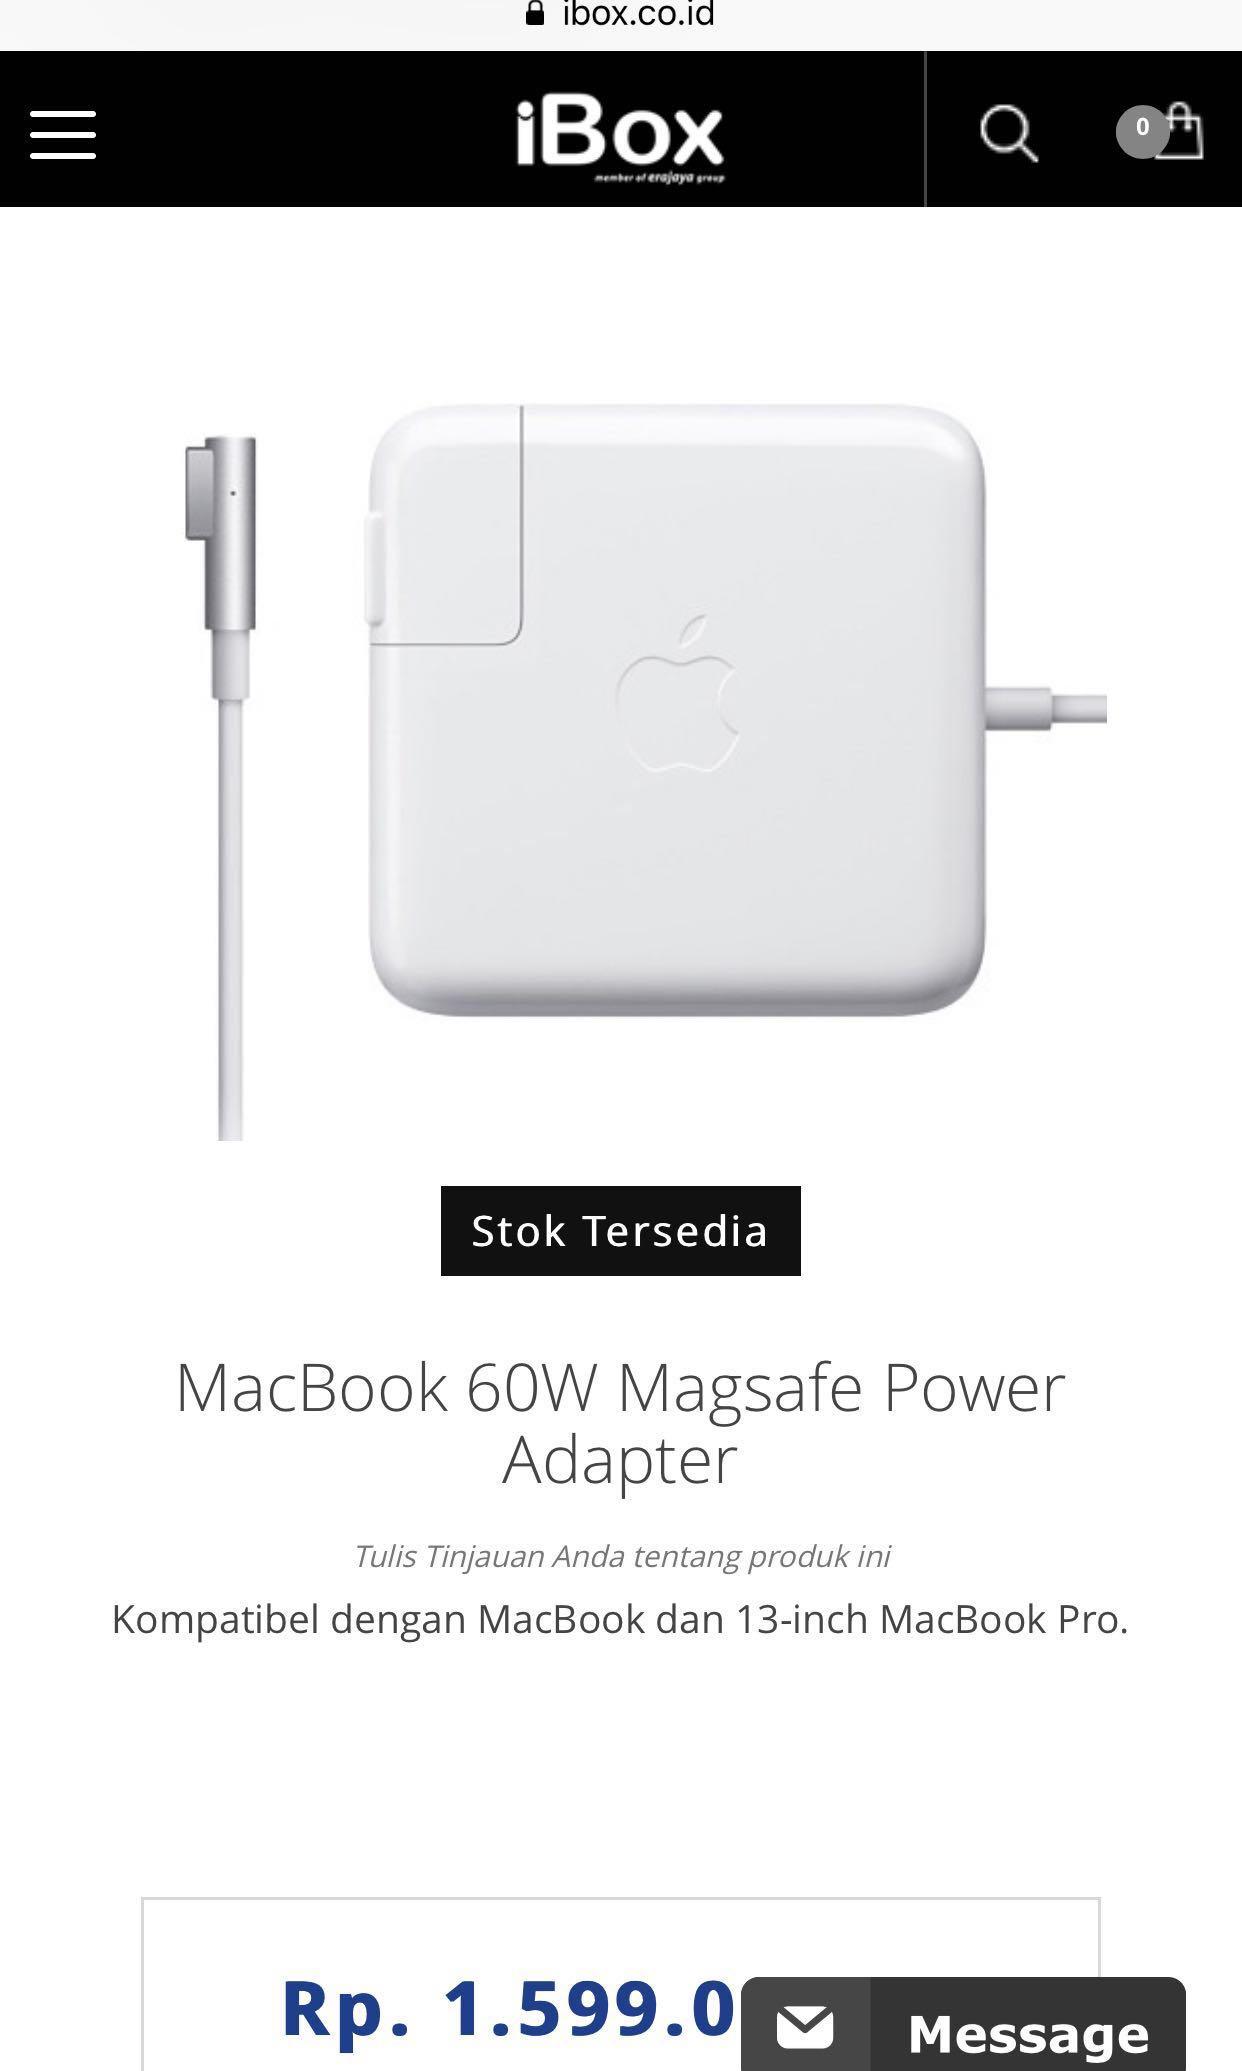 Dijual Charger Macbook Pro Original Ibox Elektronik Bagian Voucher Venom Rp 5000000 Photo